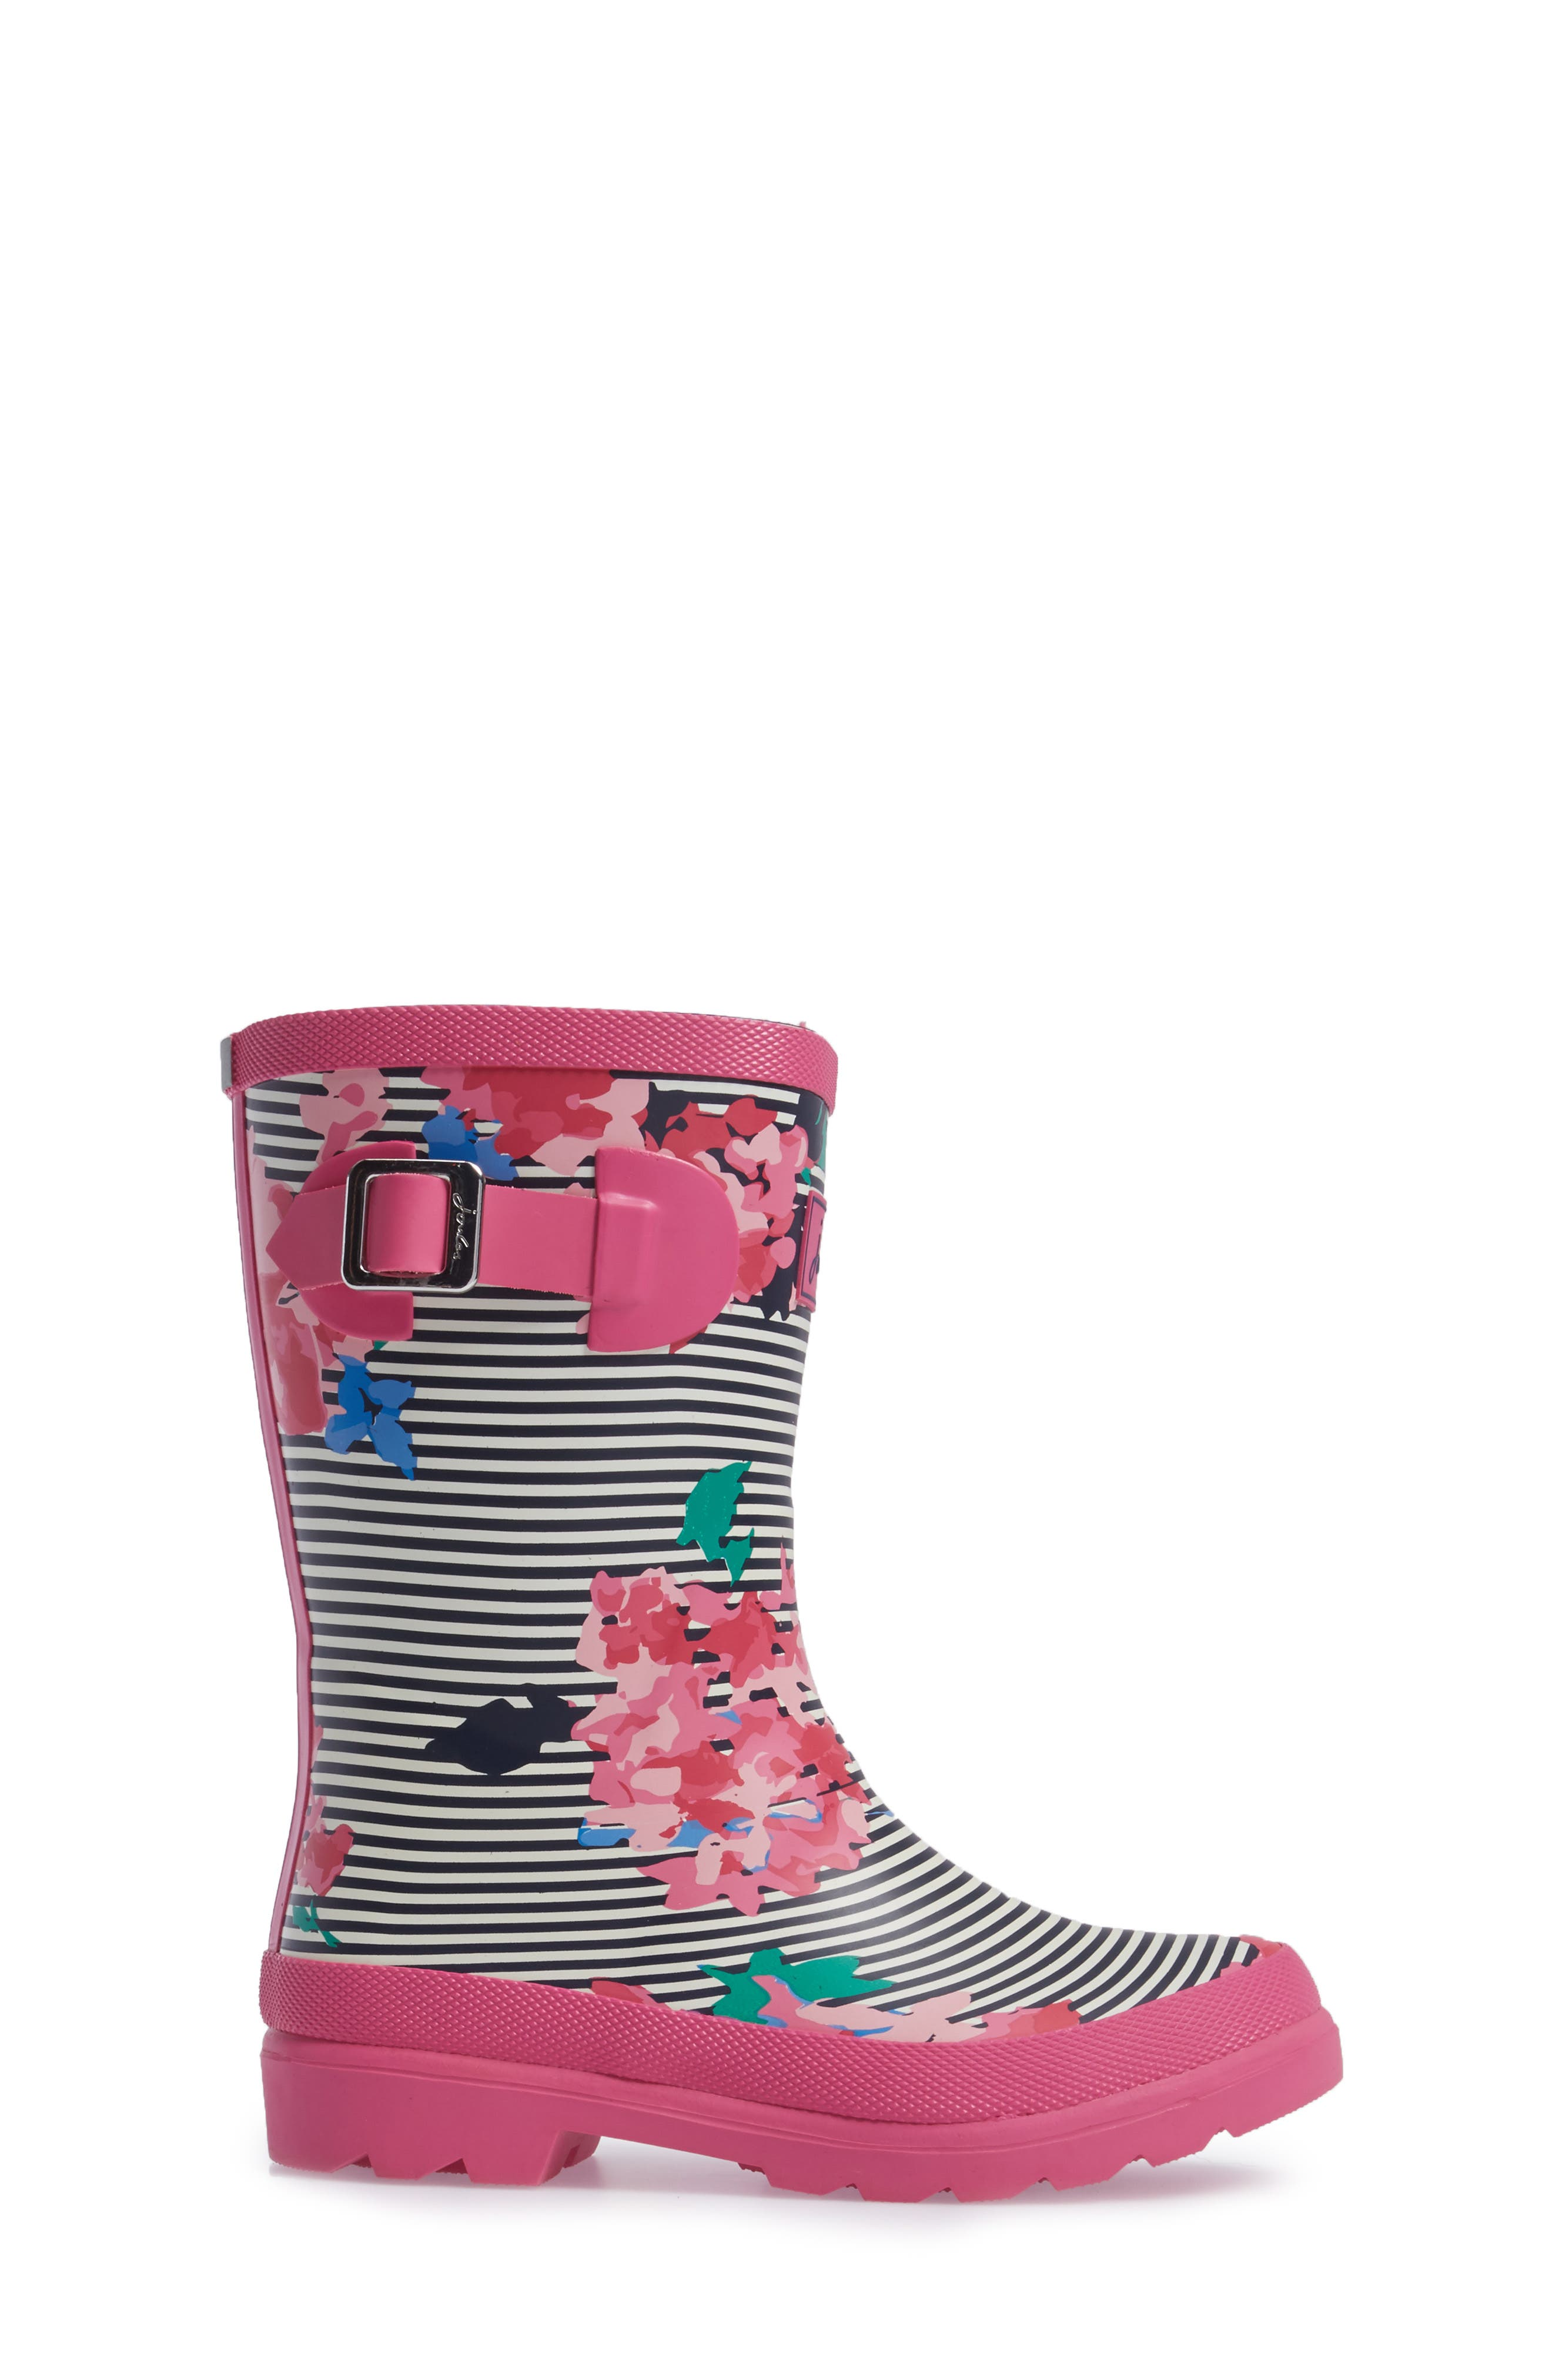 Welly Printed Waterproof Rain Boot,                             Alternate thumbnail 3, color,                             PINK STRIPE FLORAL